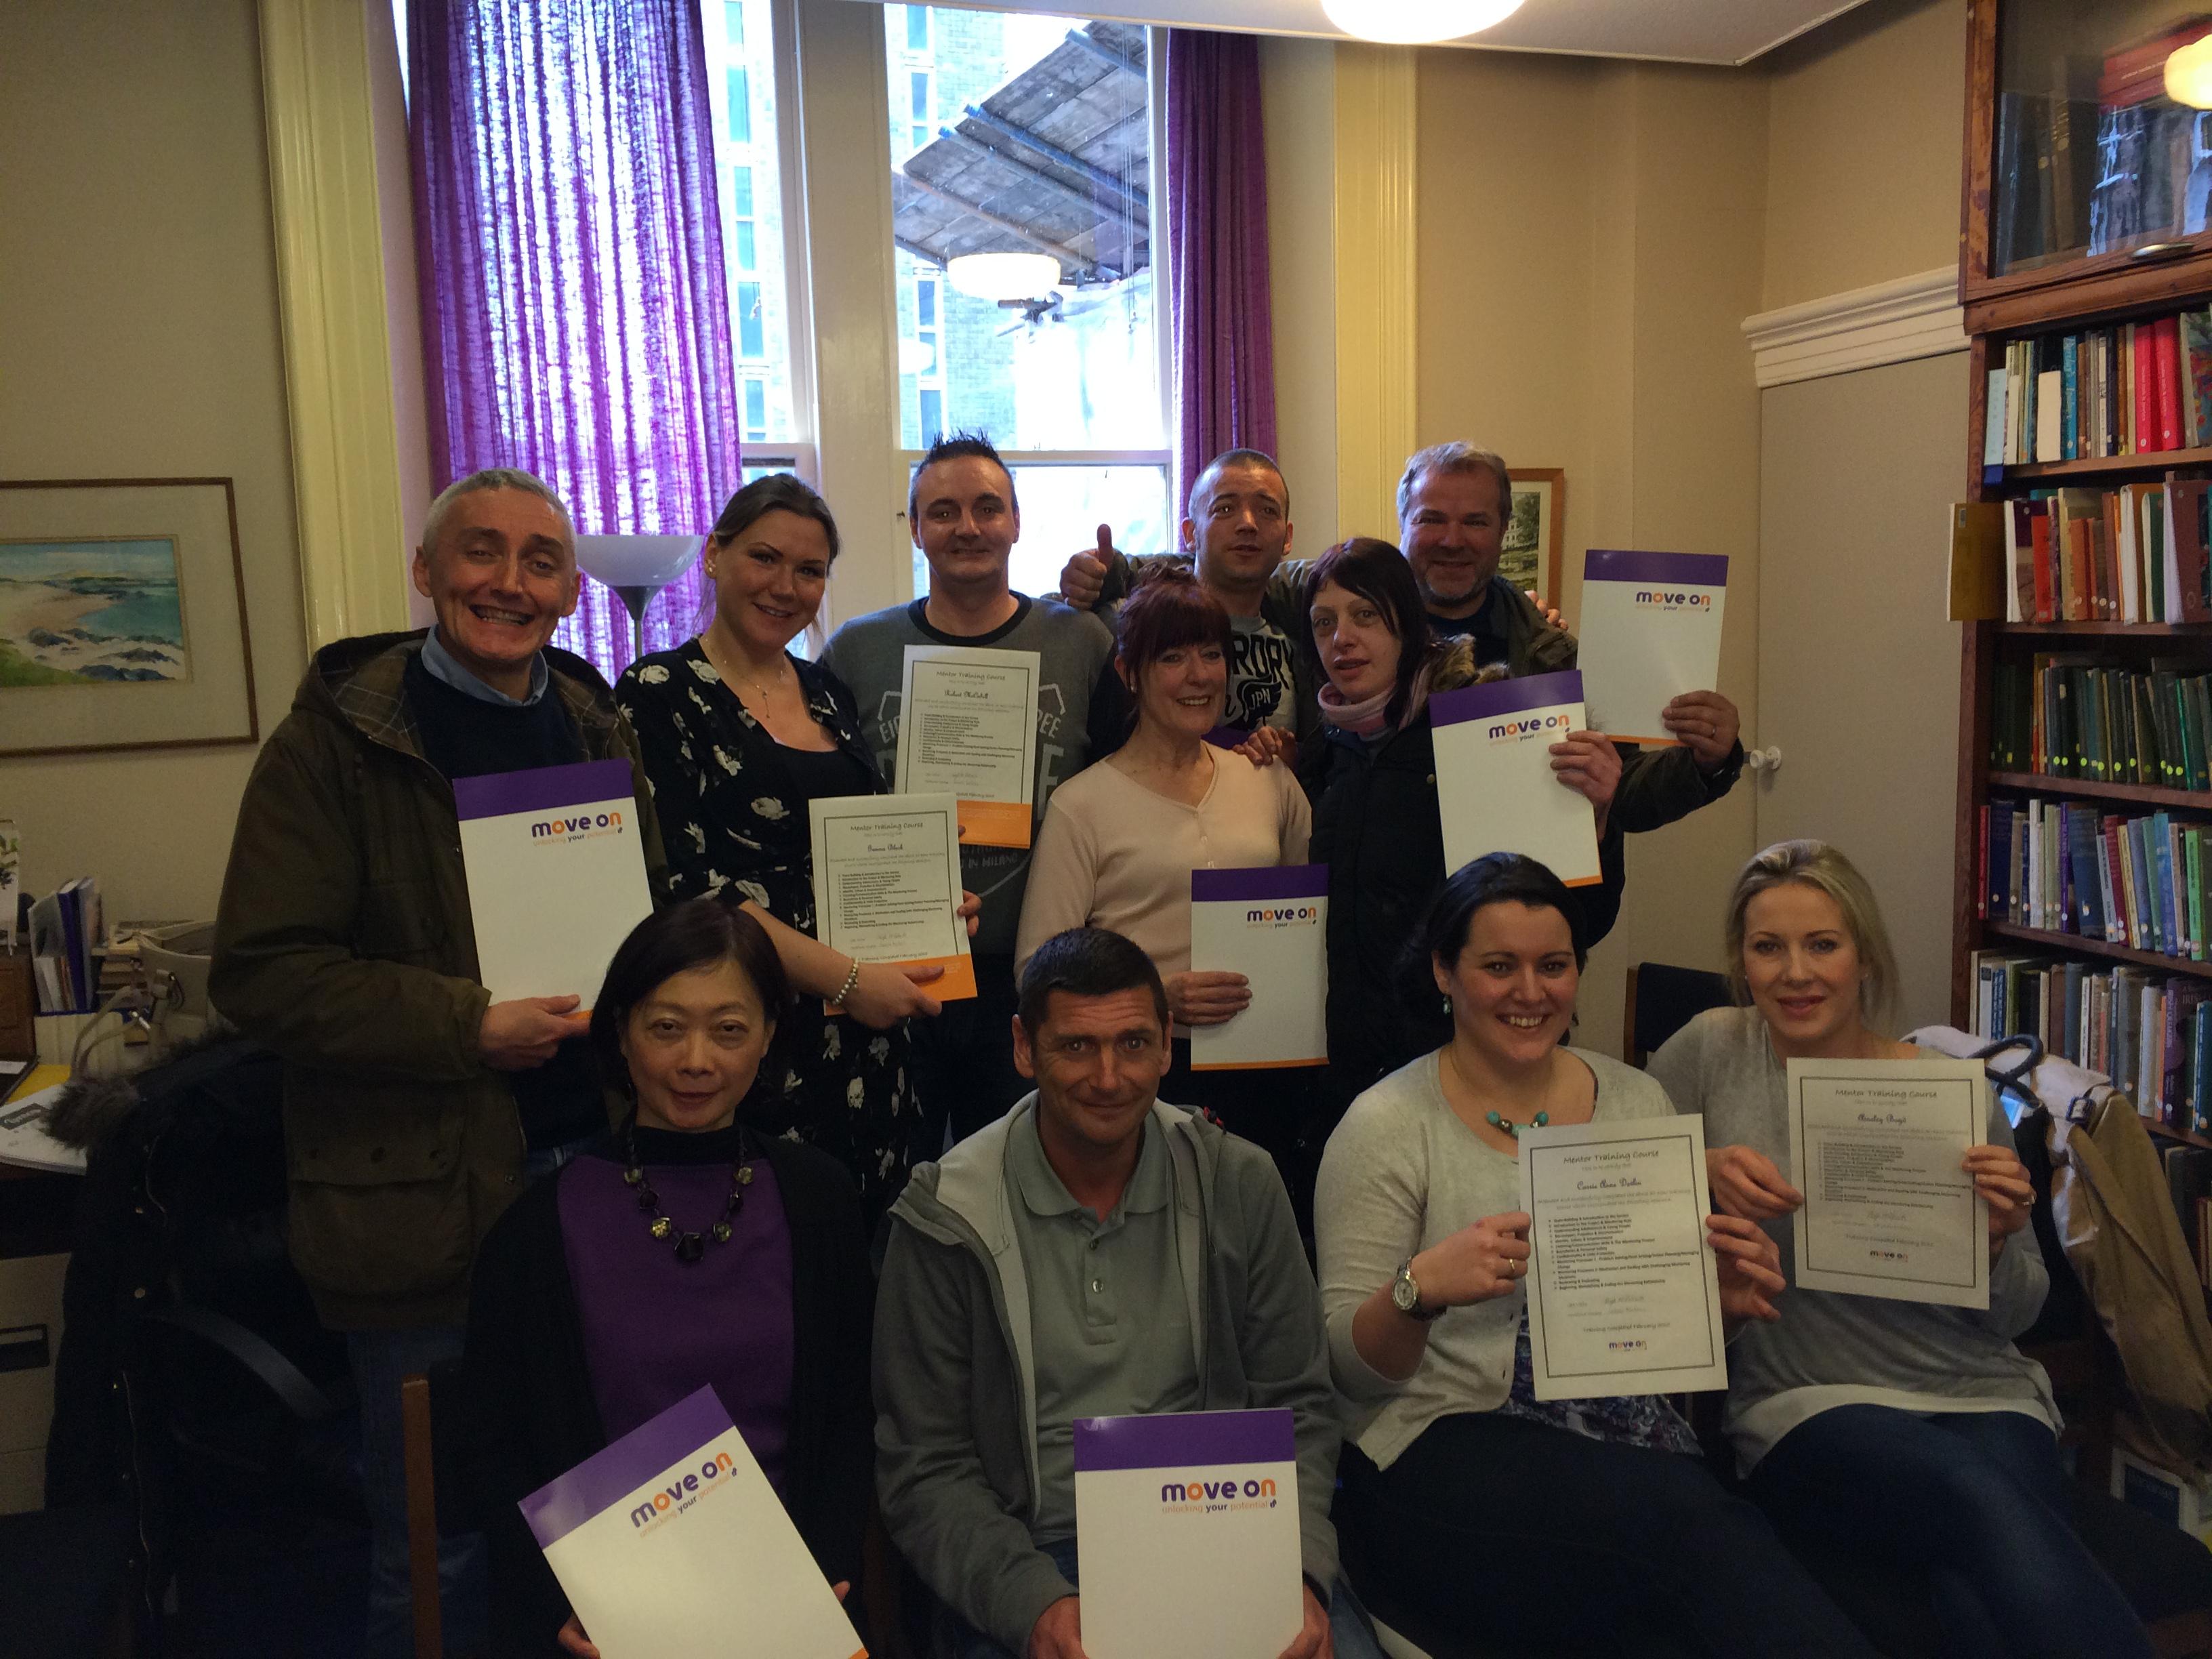 Glasgow mentors receive certificates